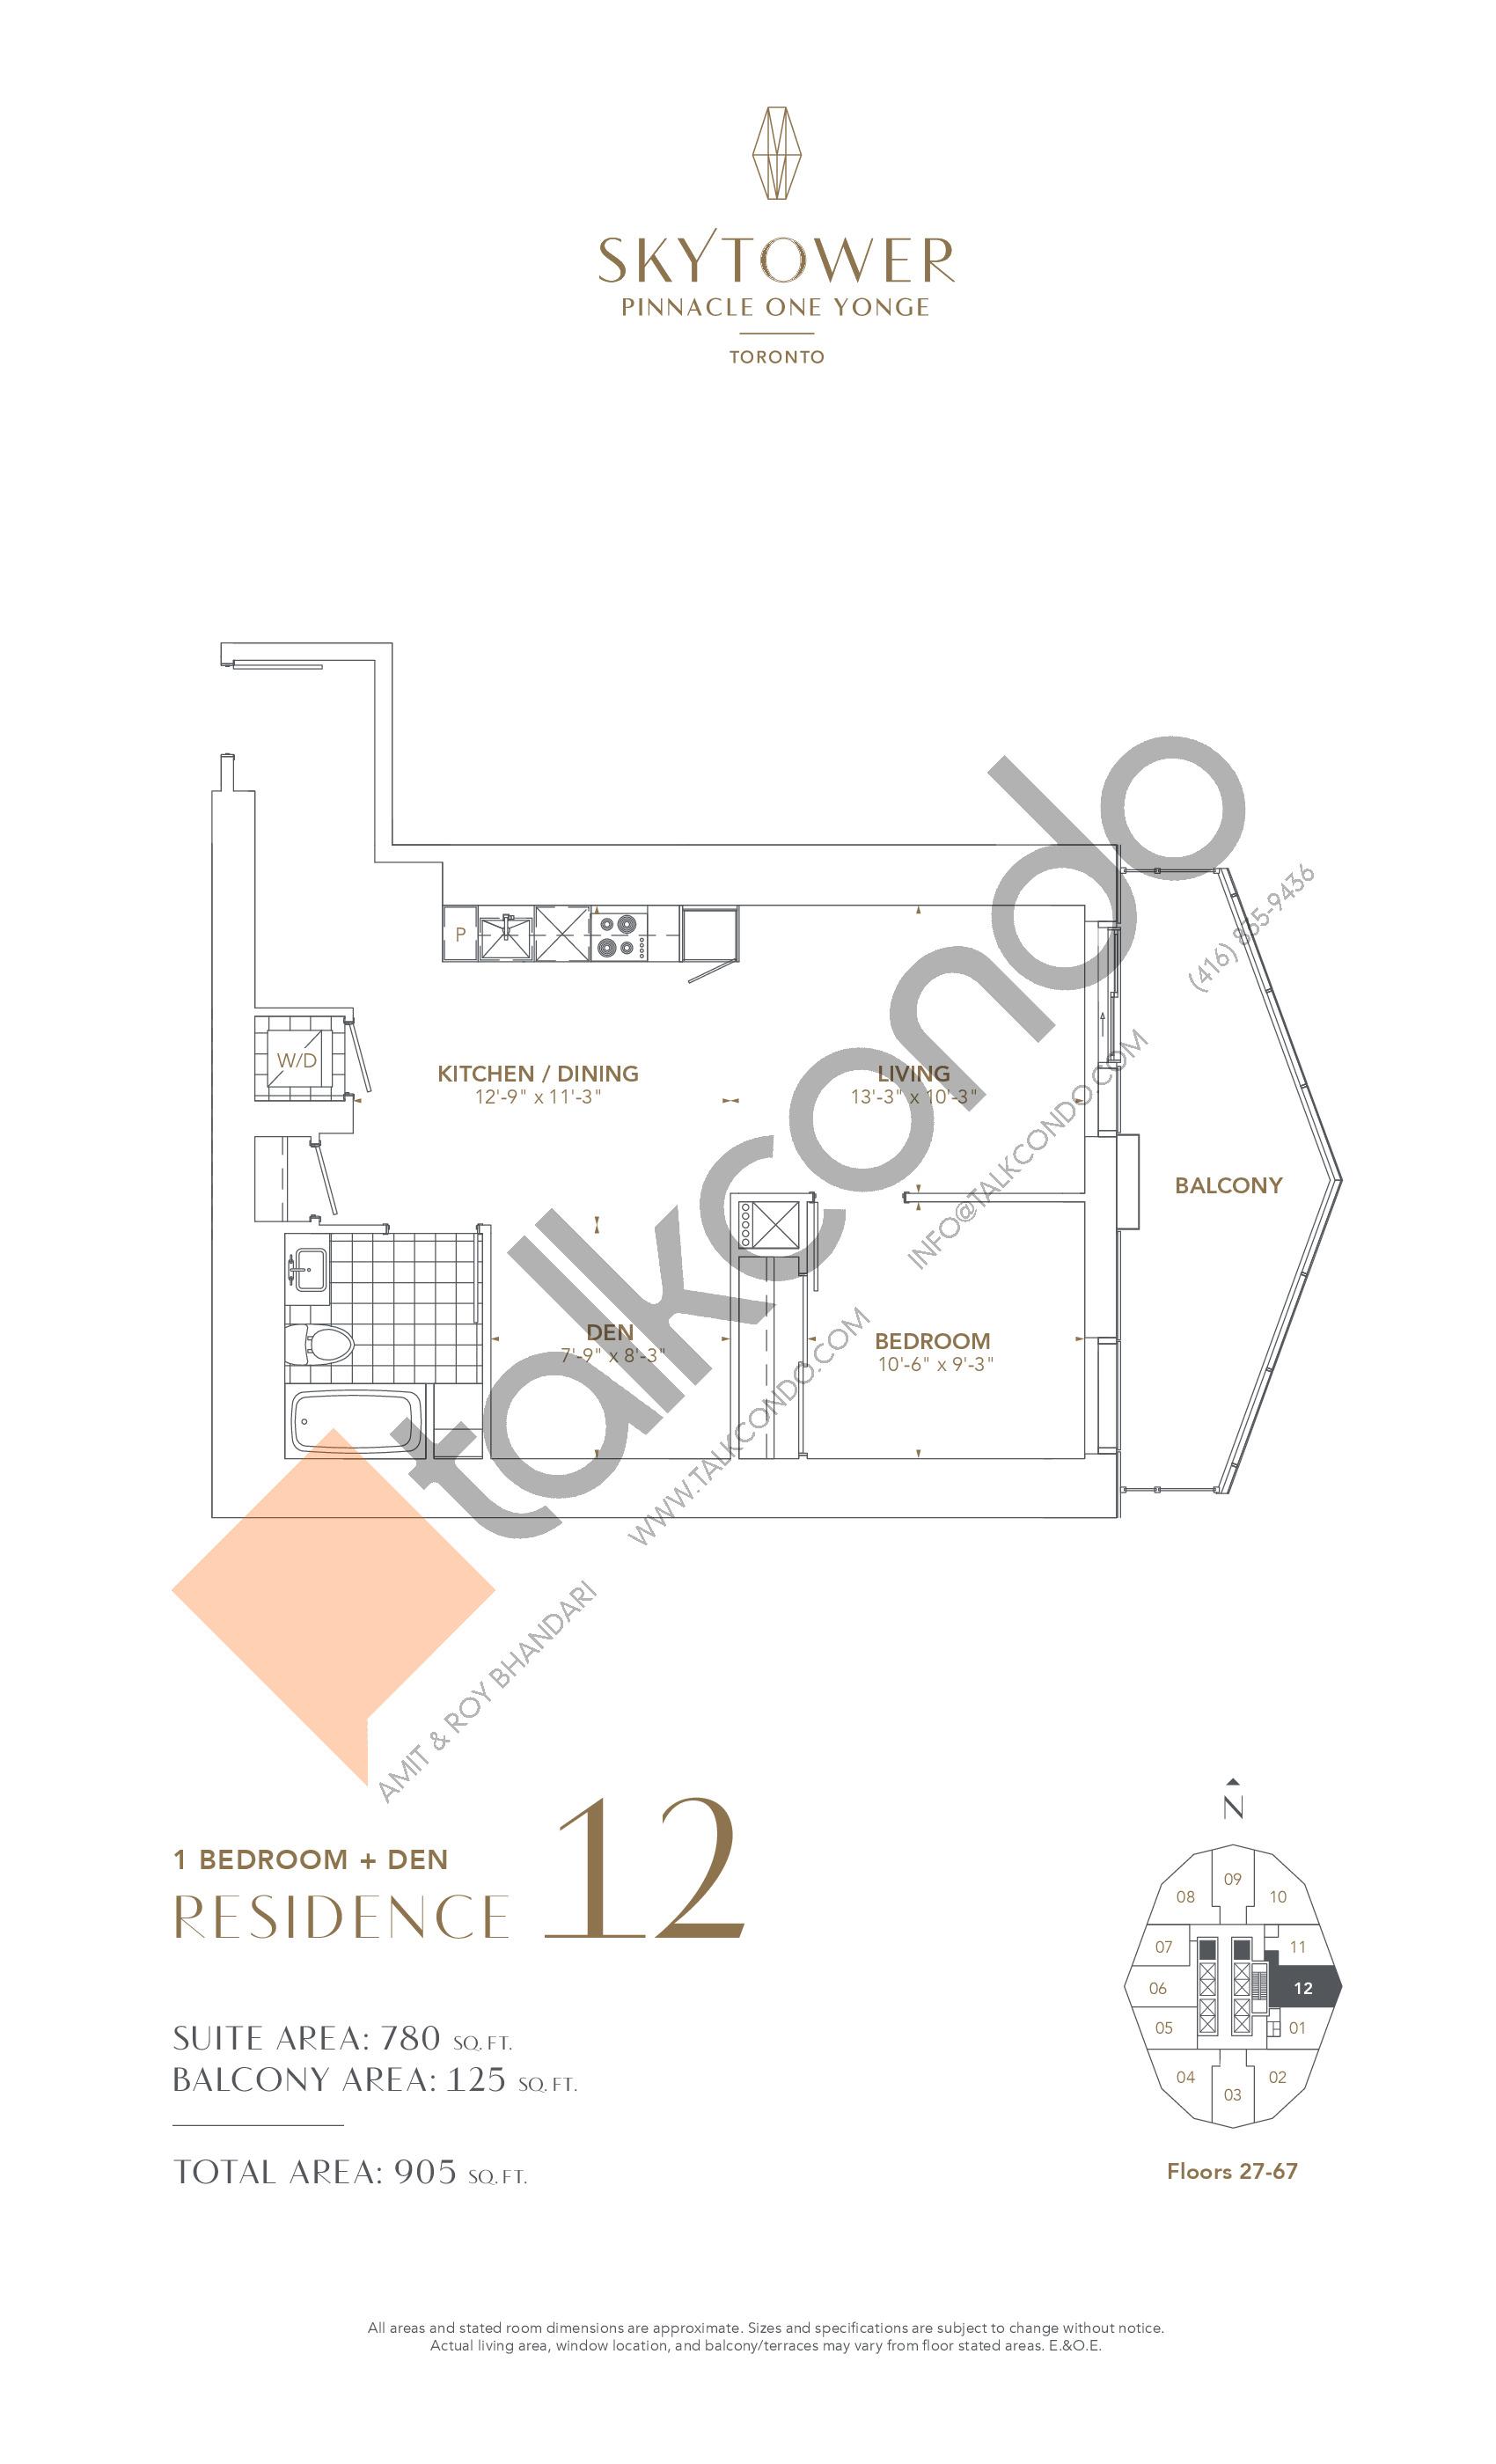 Residence 12 Floor Plan at SkyTower at Pinnacle One Yonge - 780 sq.ft